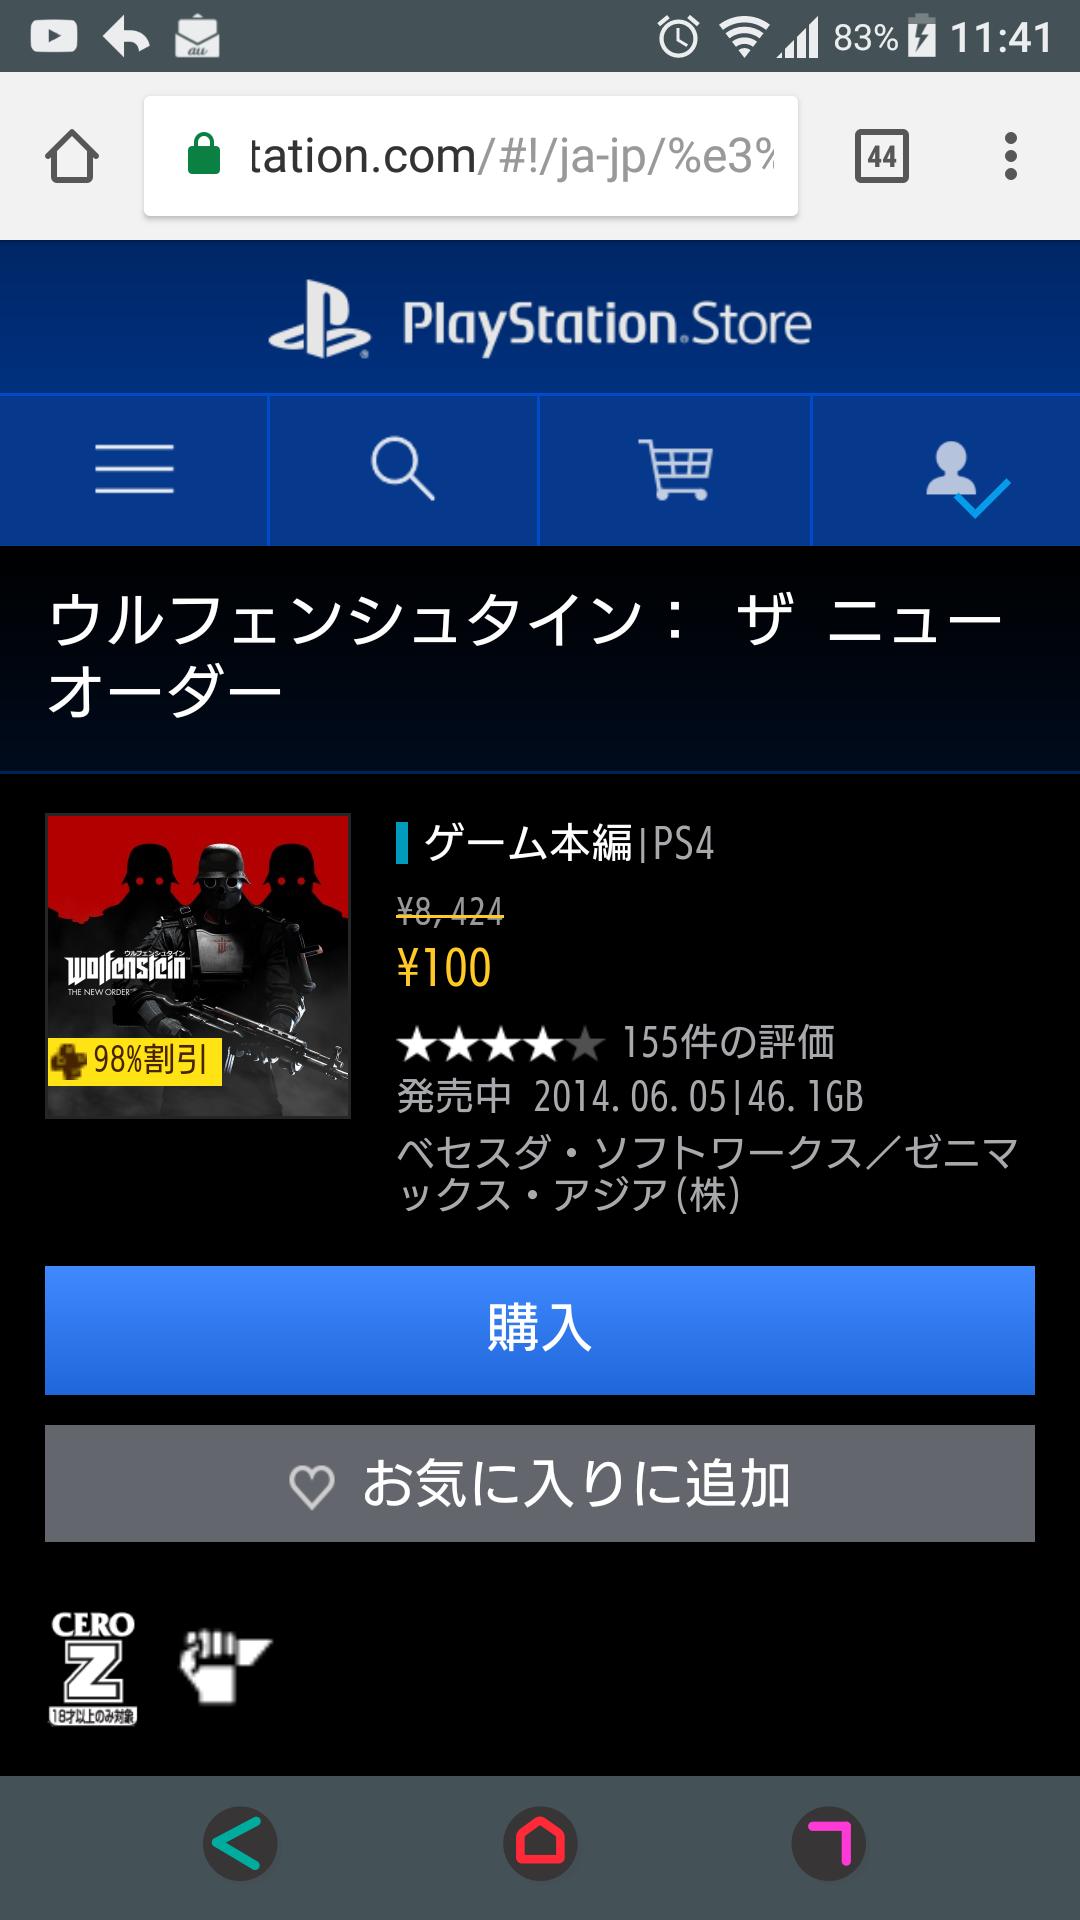 【PS4】ウルフェンシュタイン:ザ・ニュー・オーダーが100円!!!